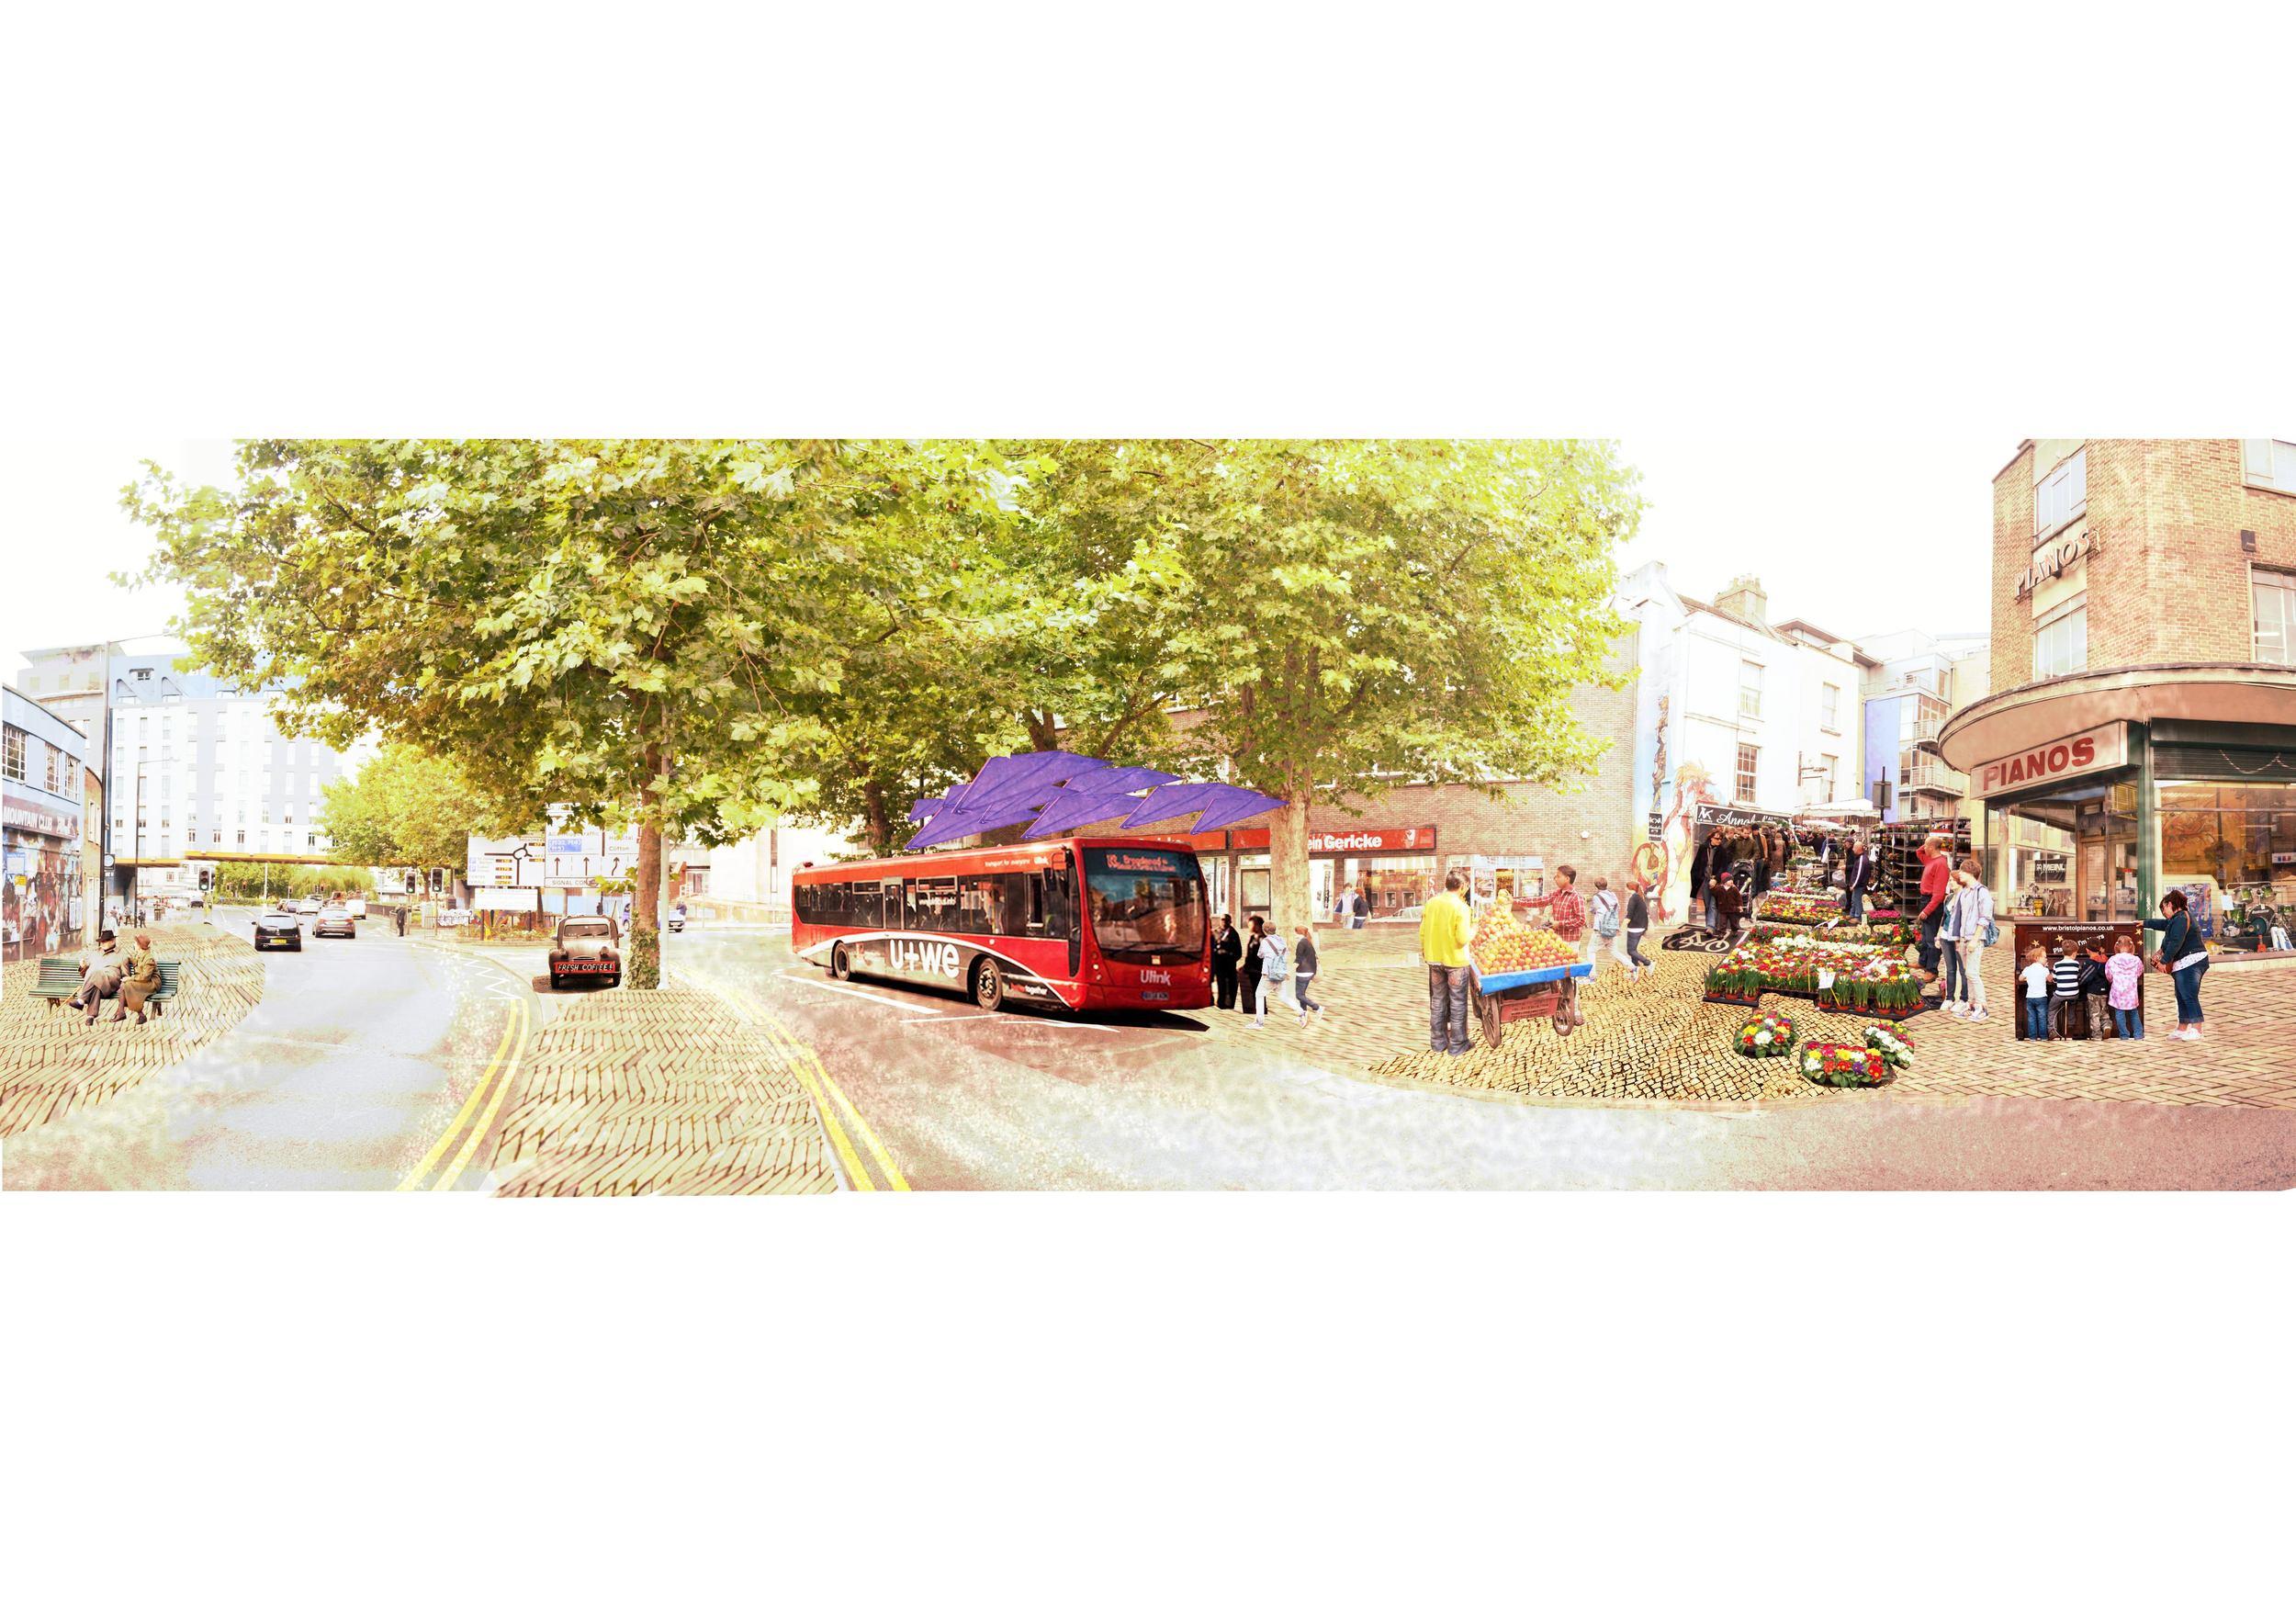 Stokes Croft streetscape